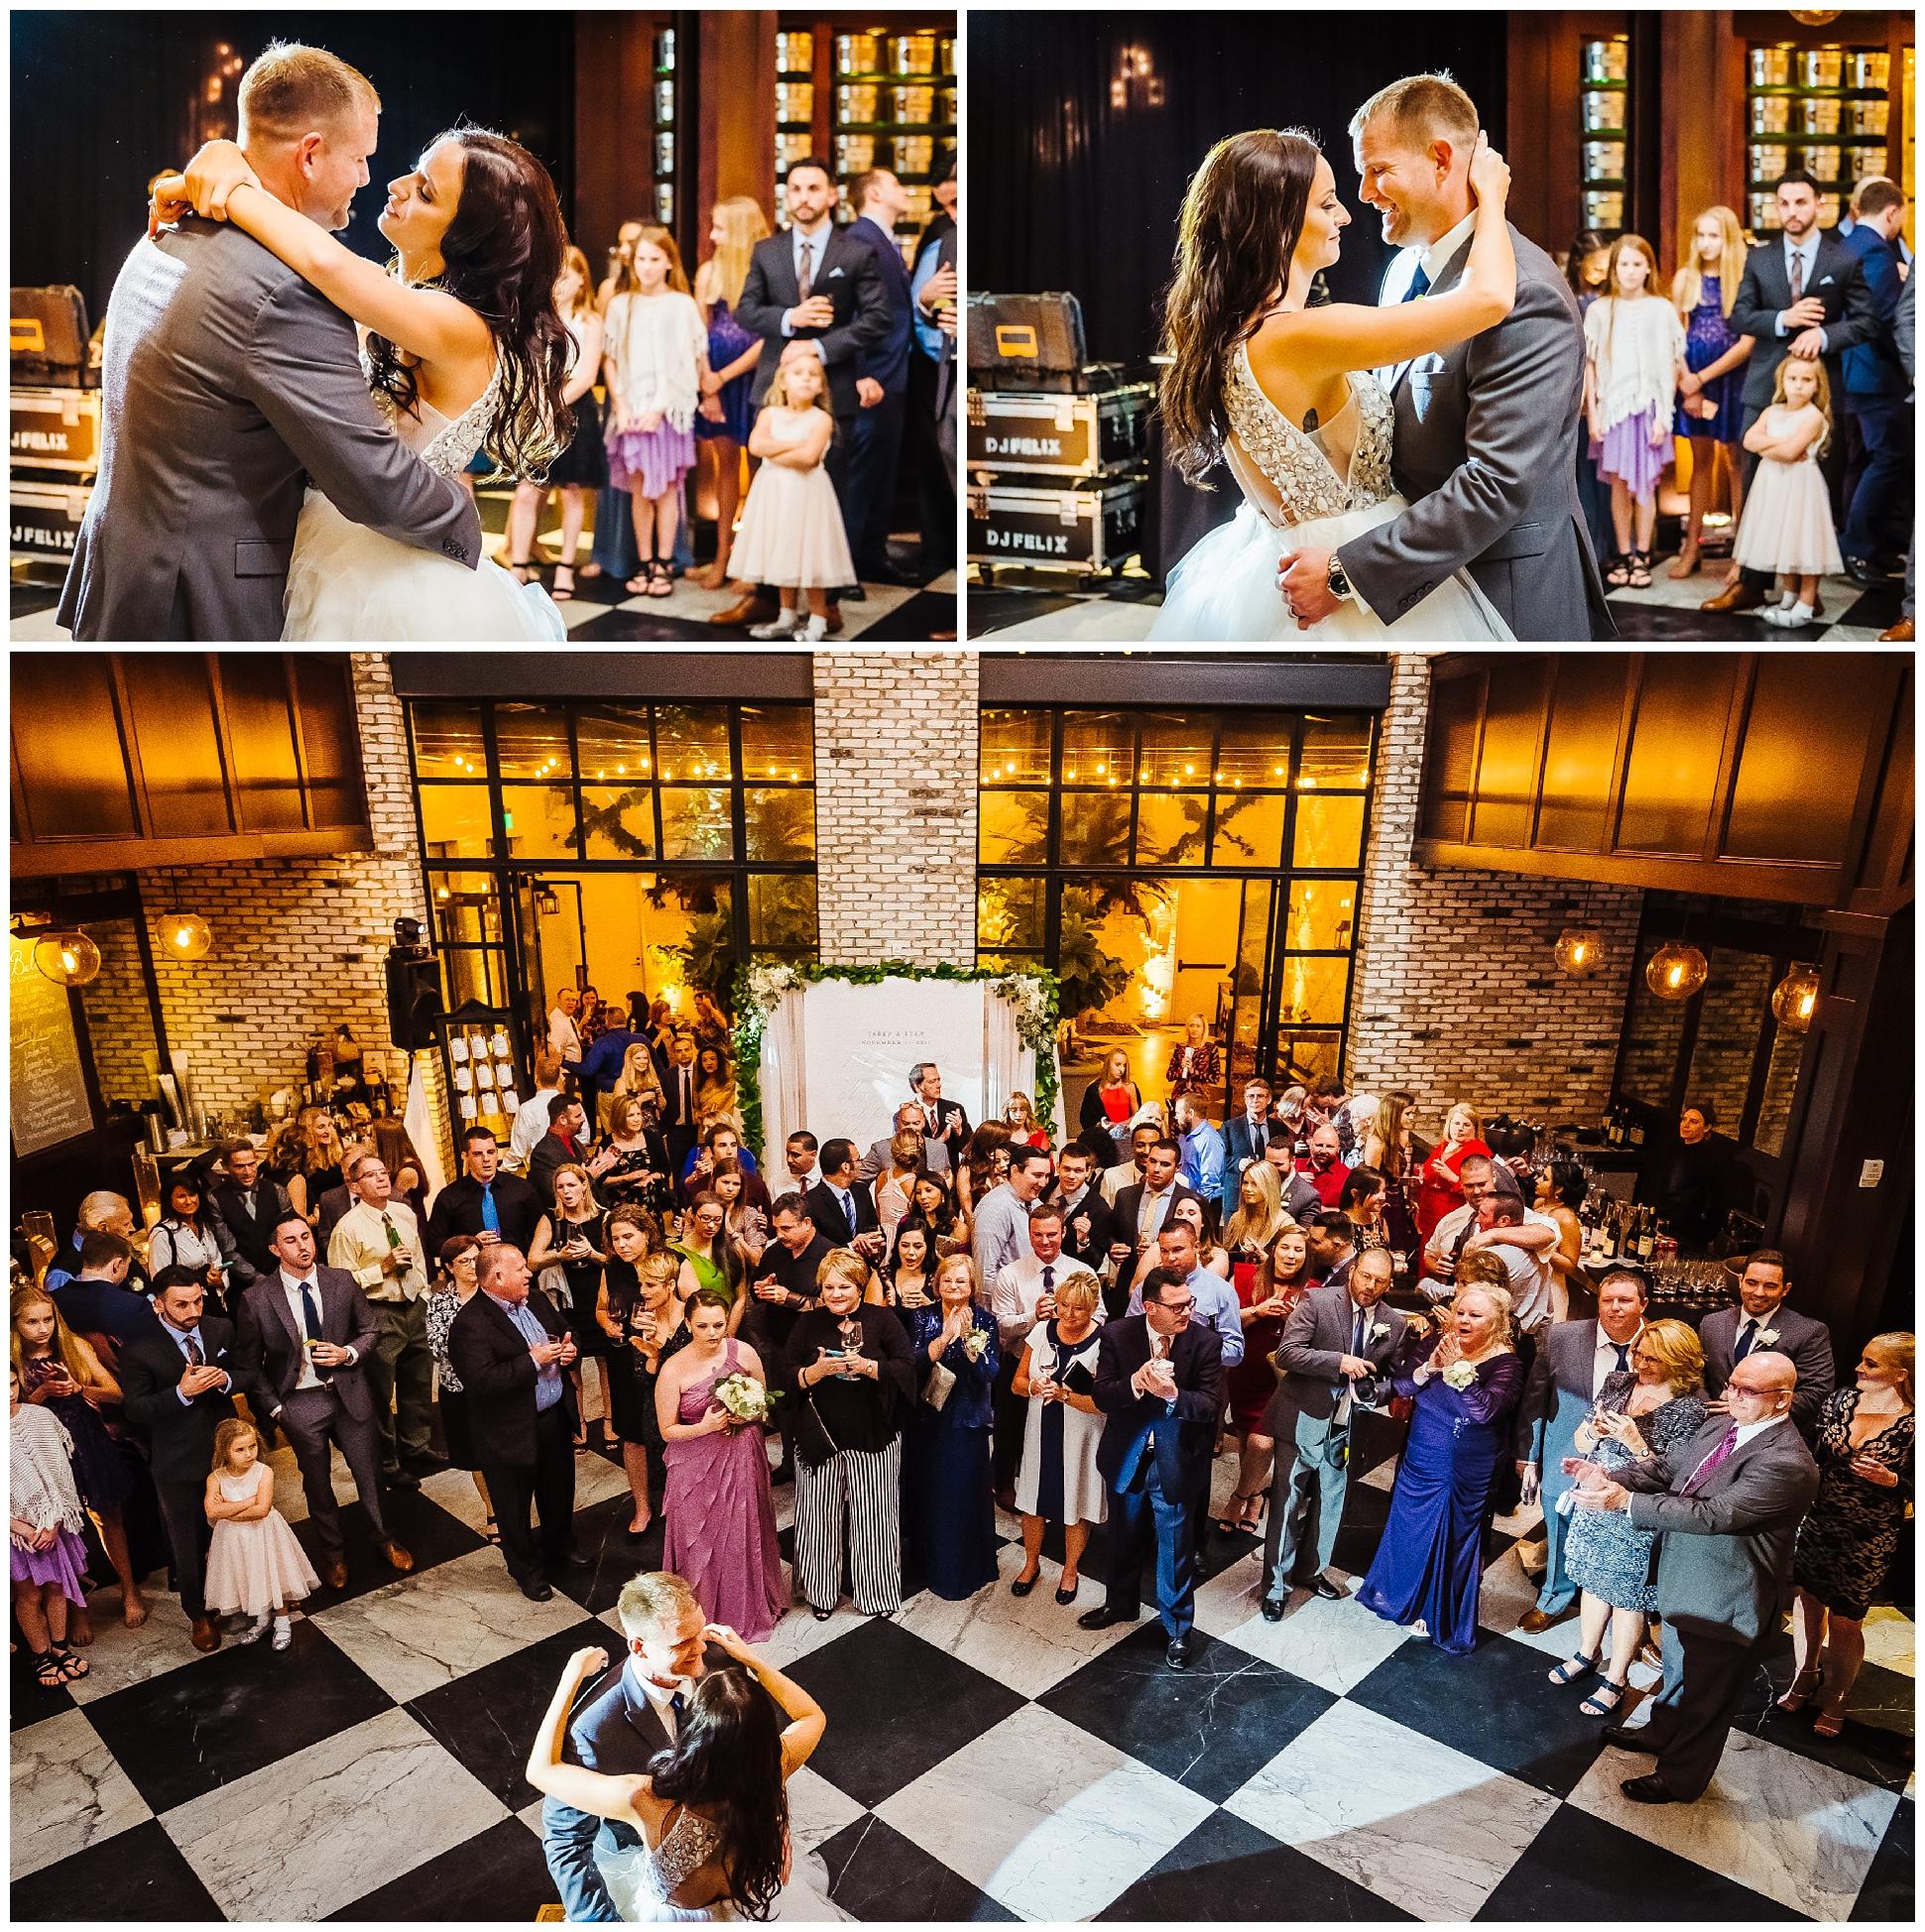 tampa-wedding-photographer-oxford-exchange-garland-candlelight-gold-hayley-paige_0055.jpg